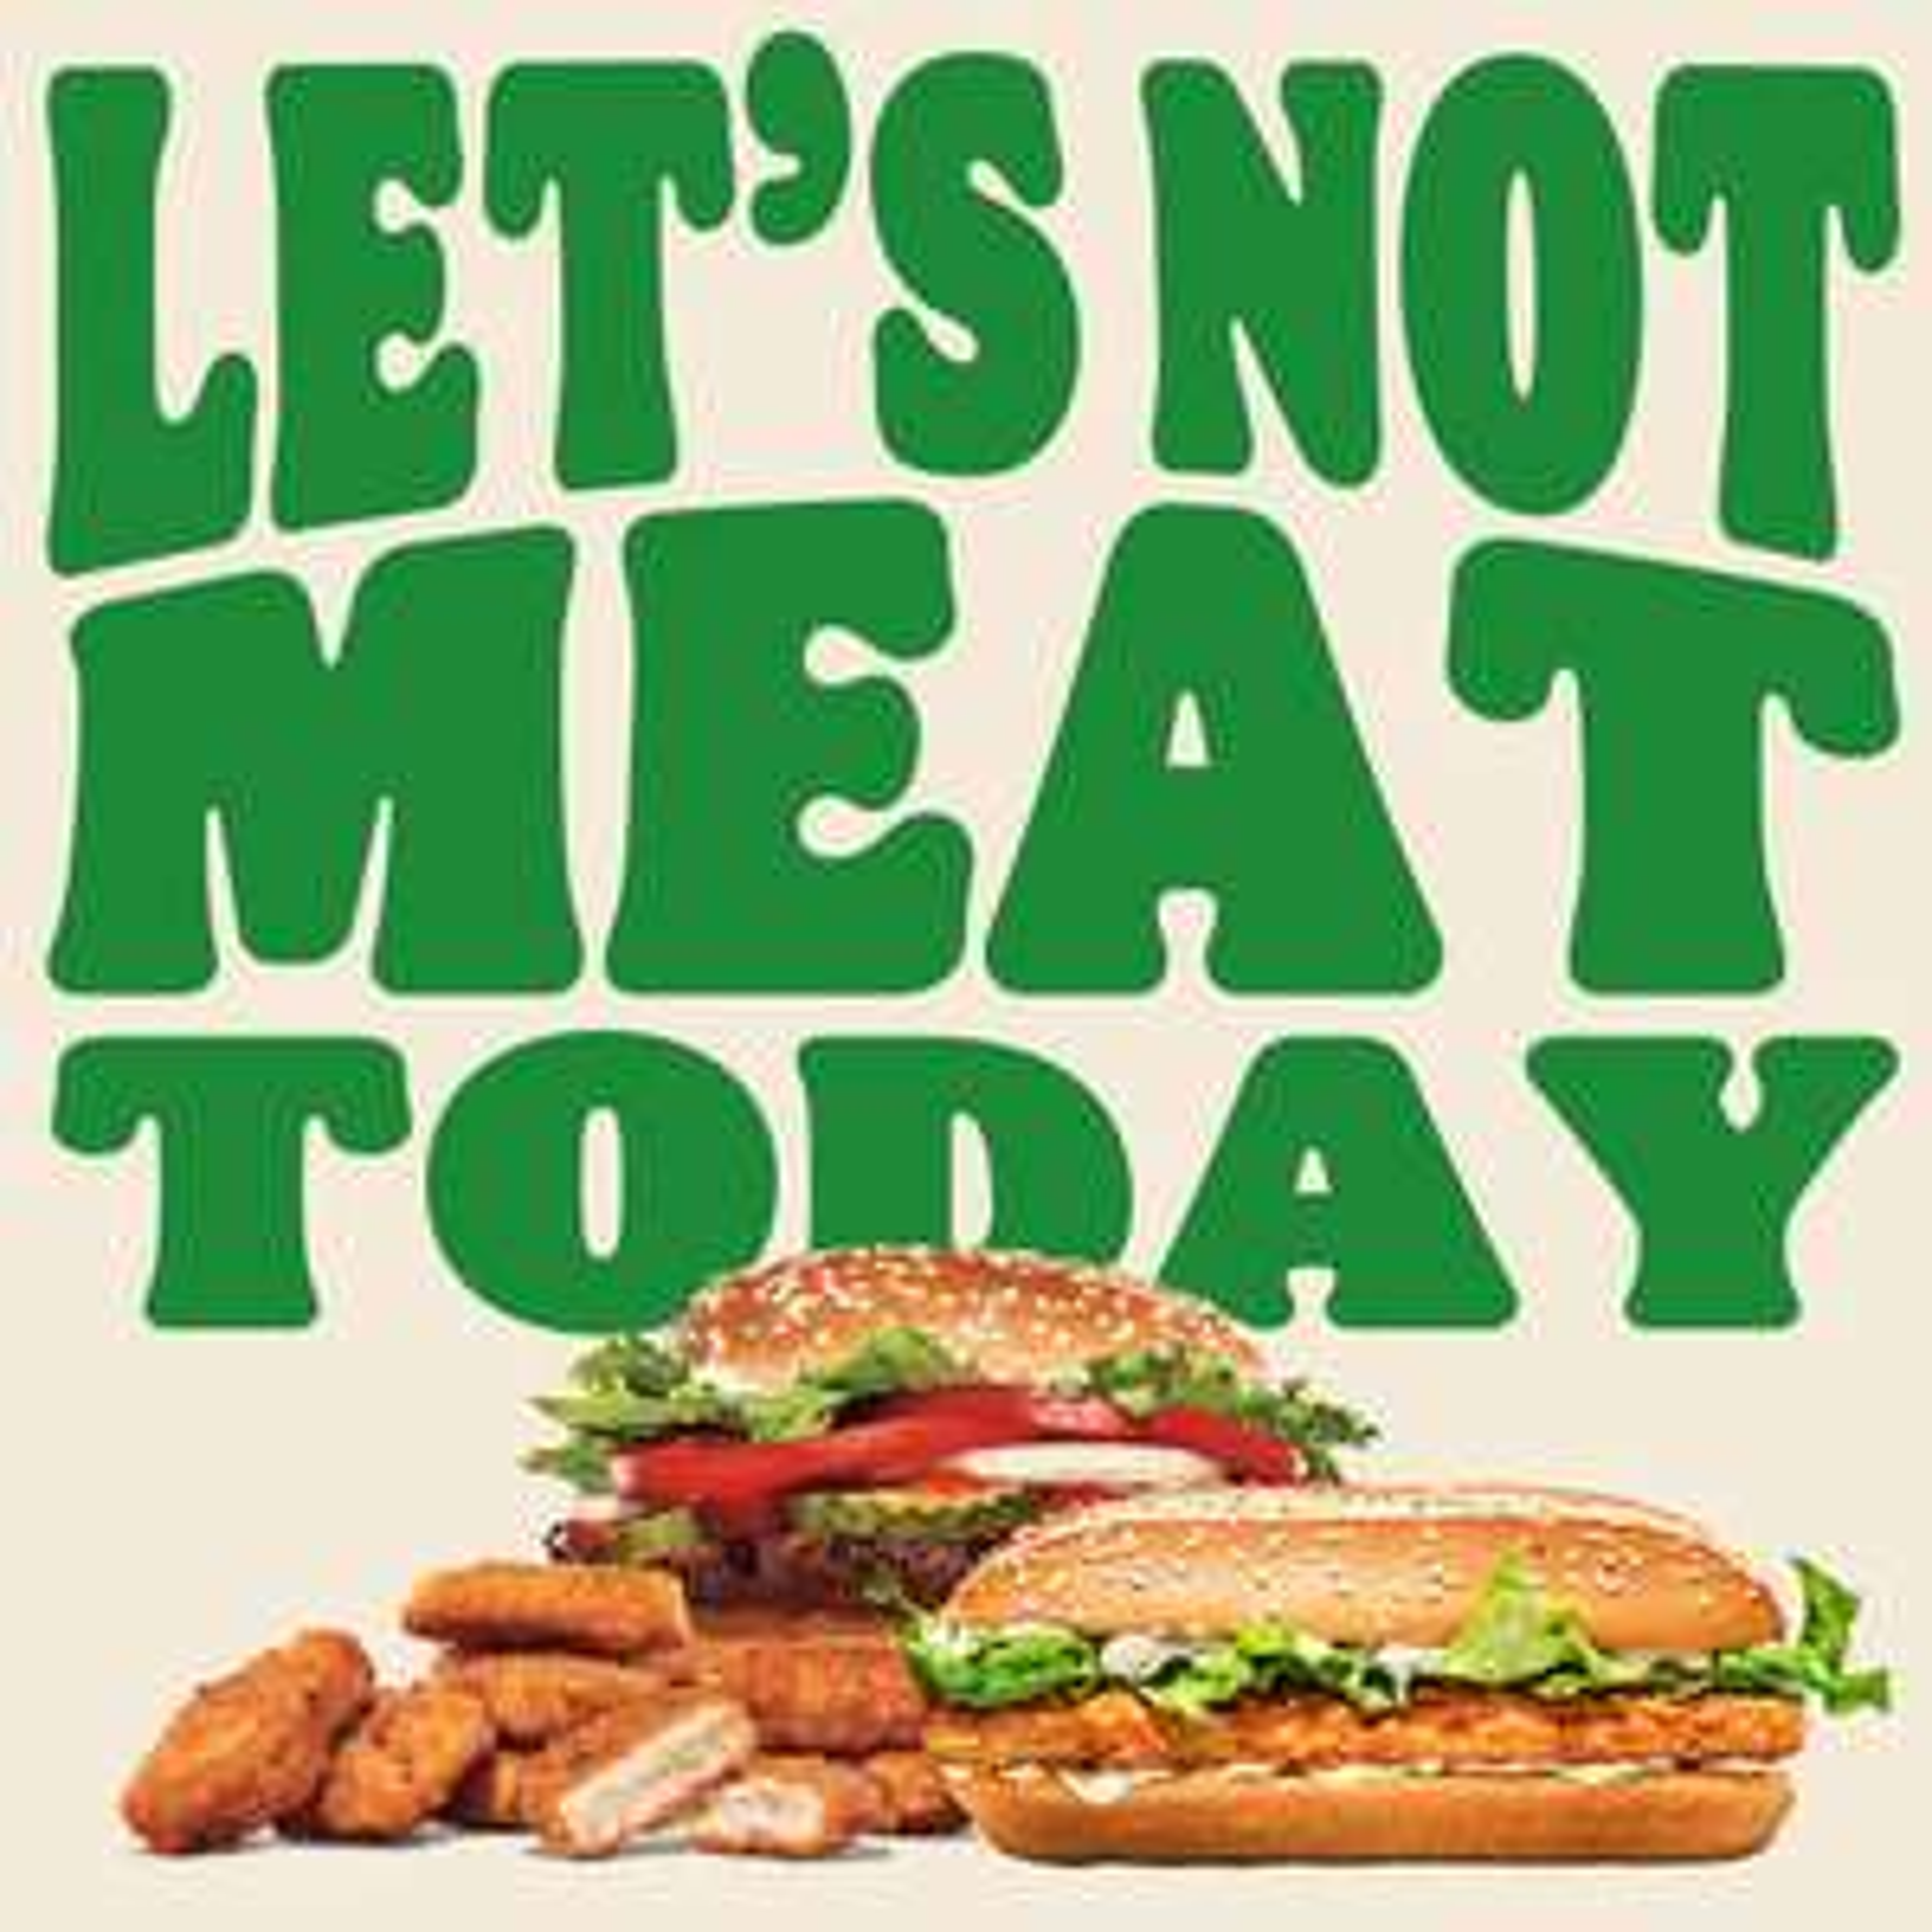 Meatless Monday (Plant-based Long Chicken, Whopper en Nuggets) @ Burger King